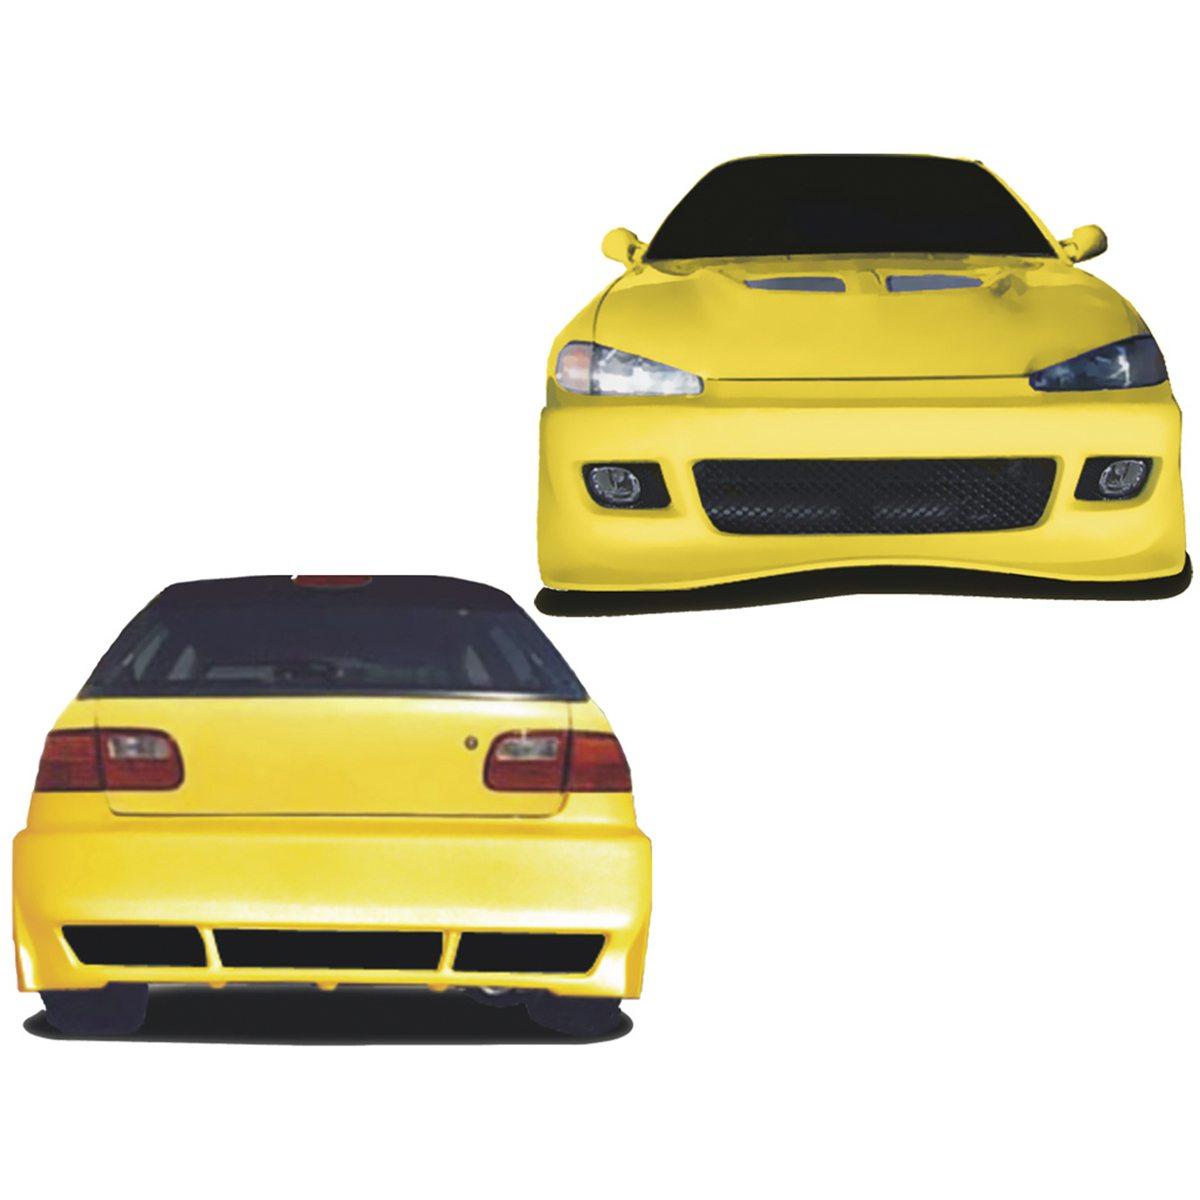 Honda-Civic-92-Futur-KIT-QTU108